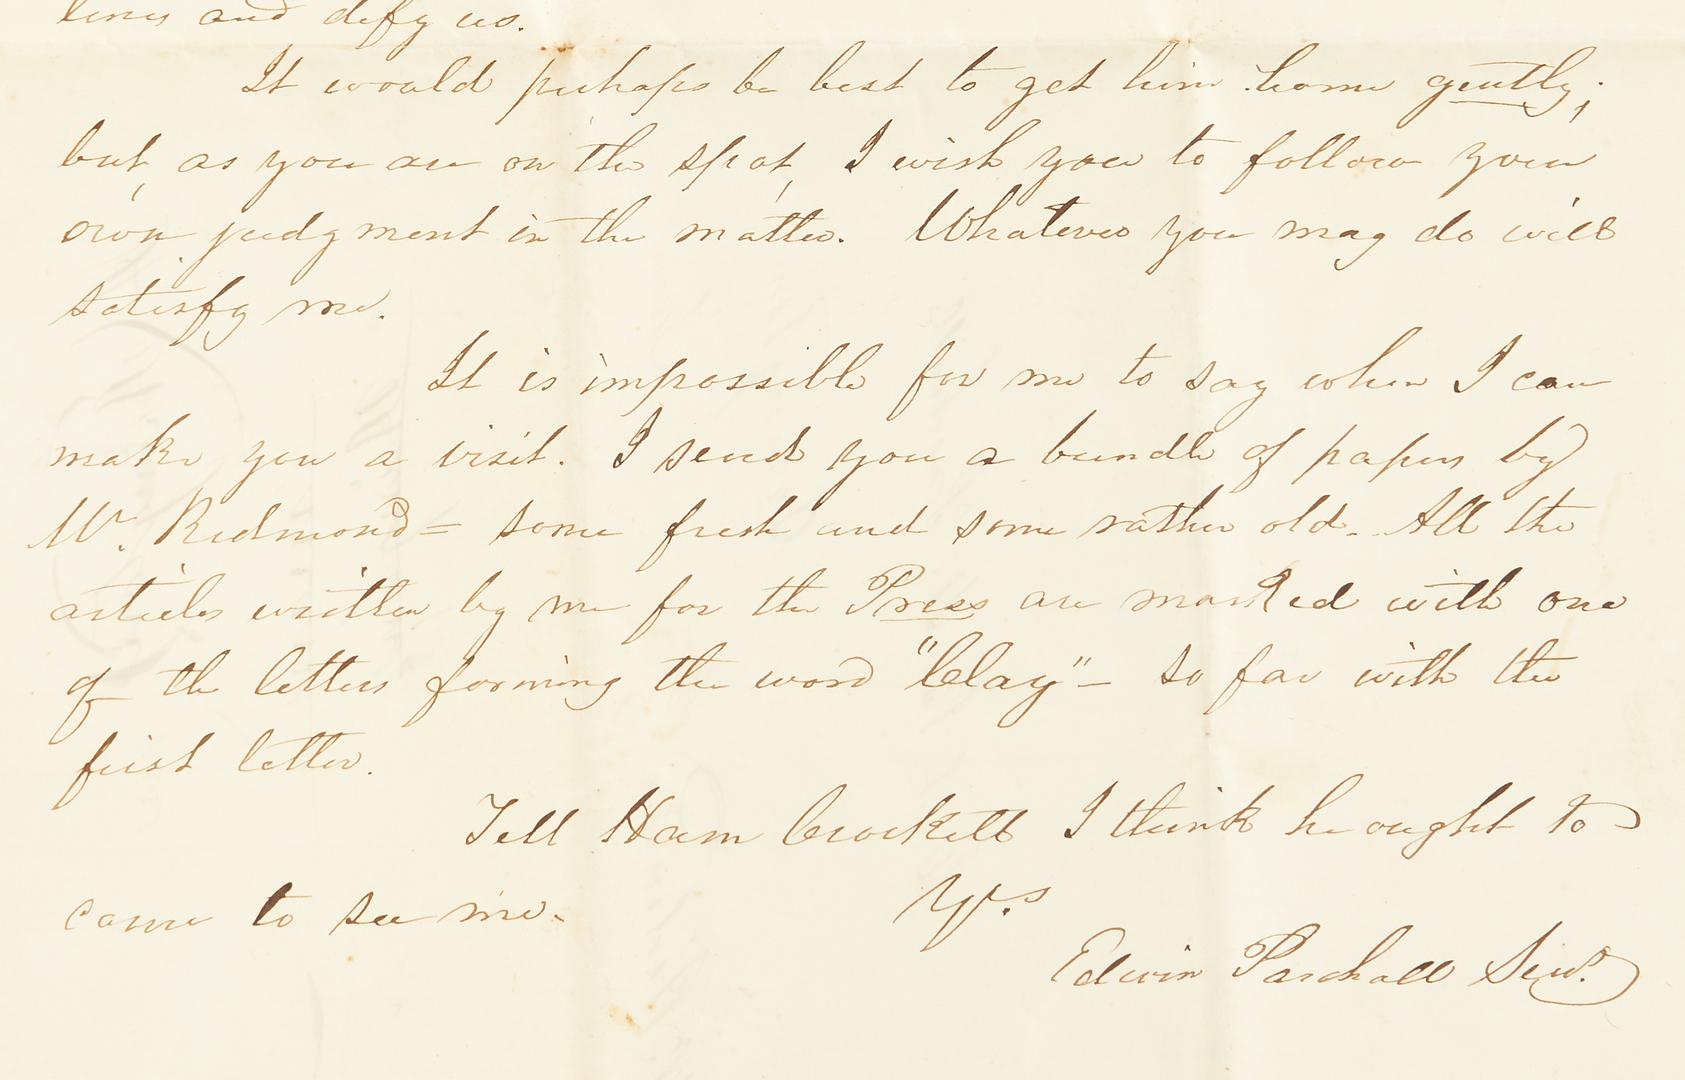 Lot 717: Civil War Buckle Plates, Letter, CDV, 6 items